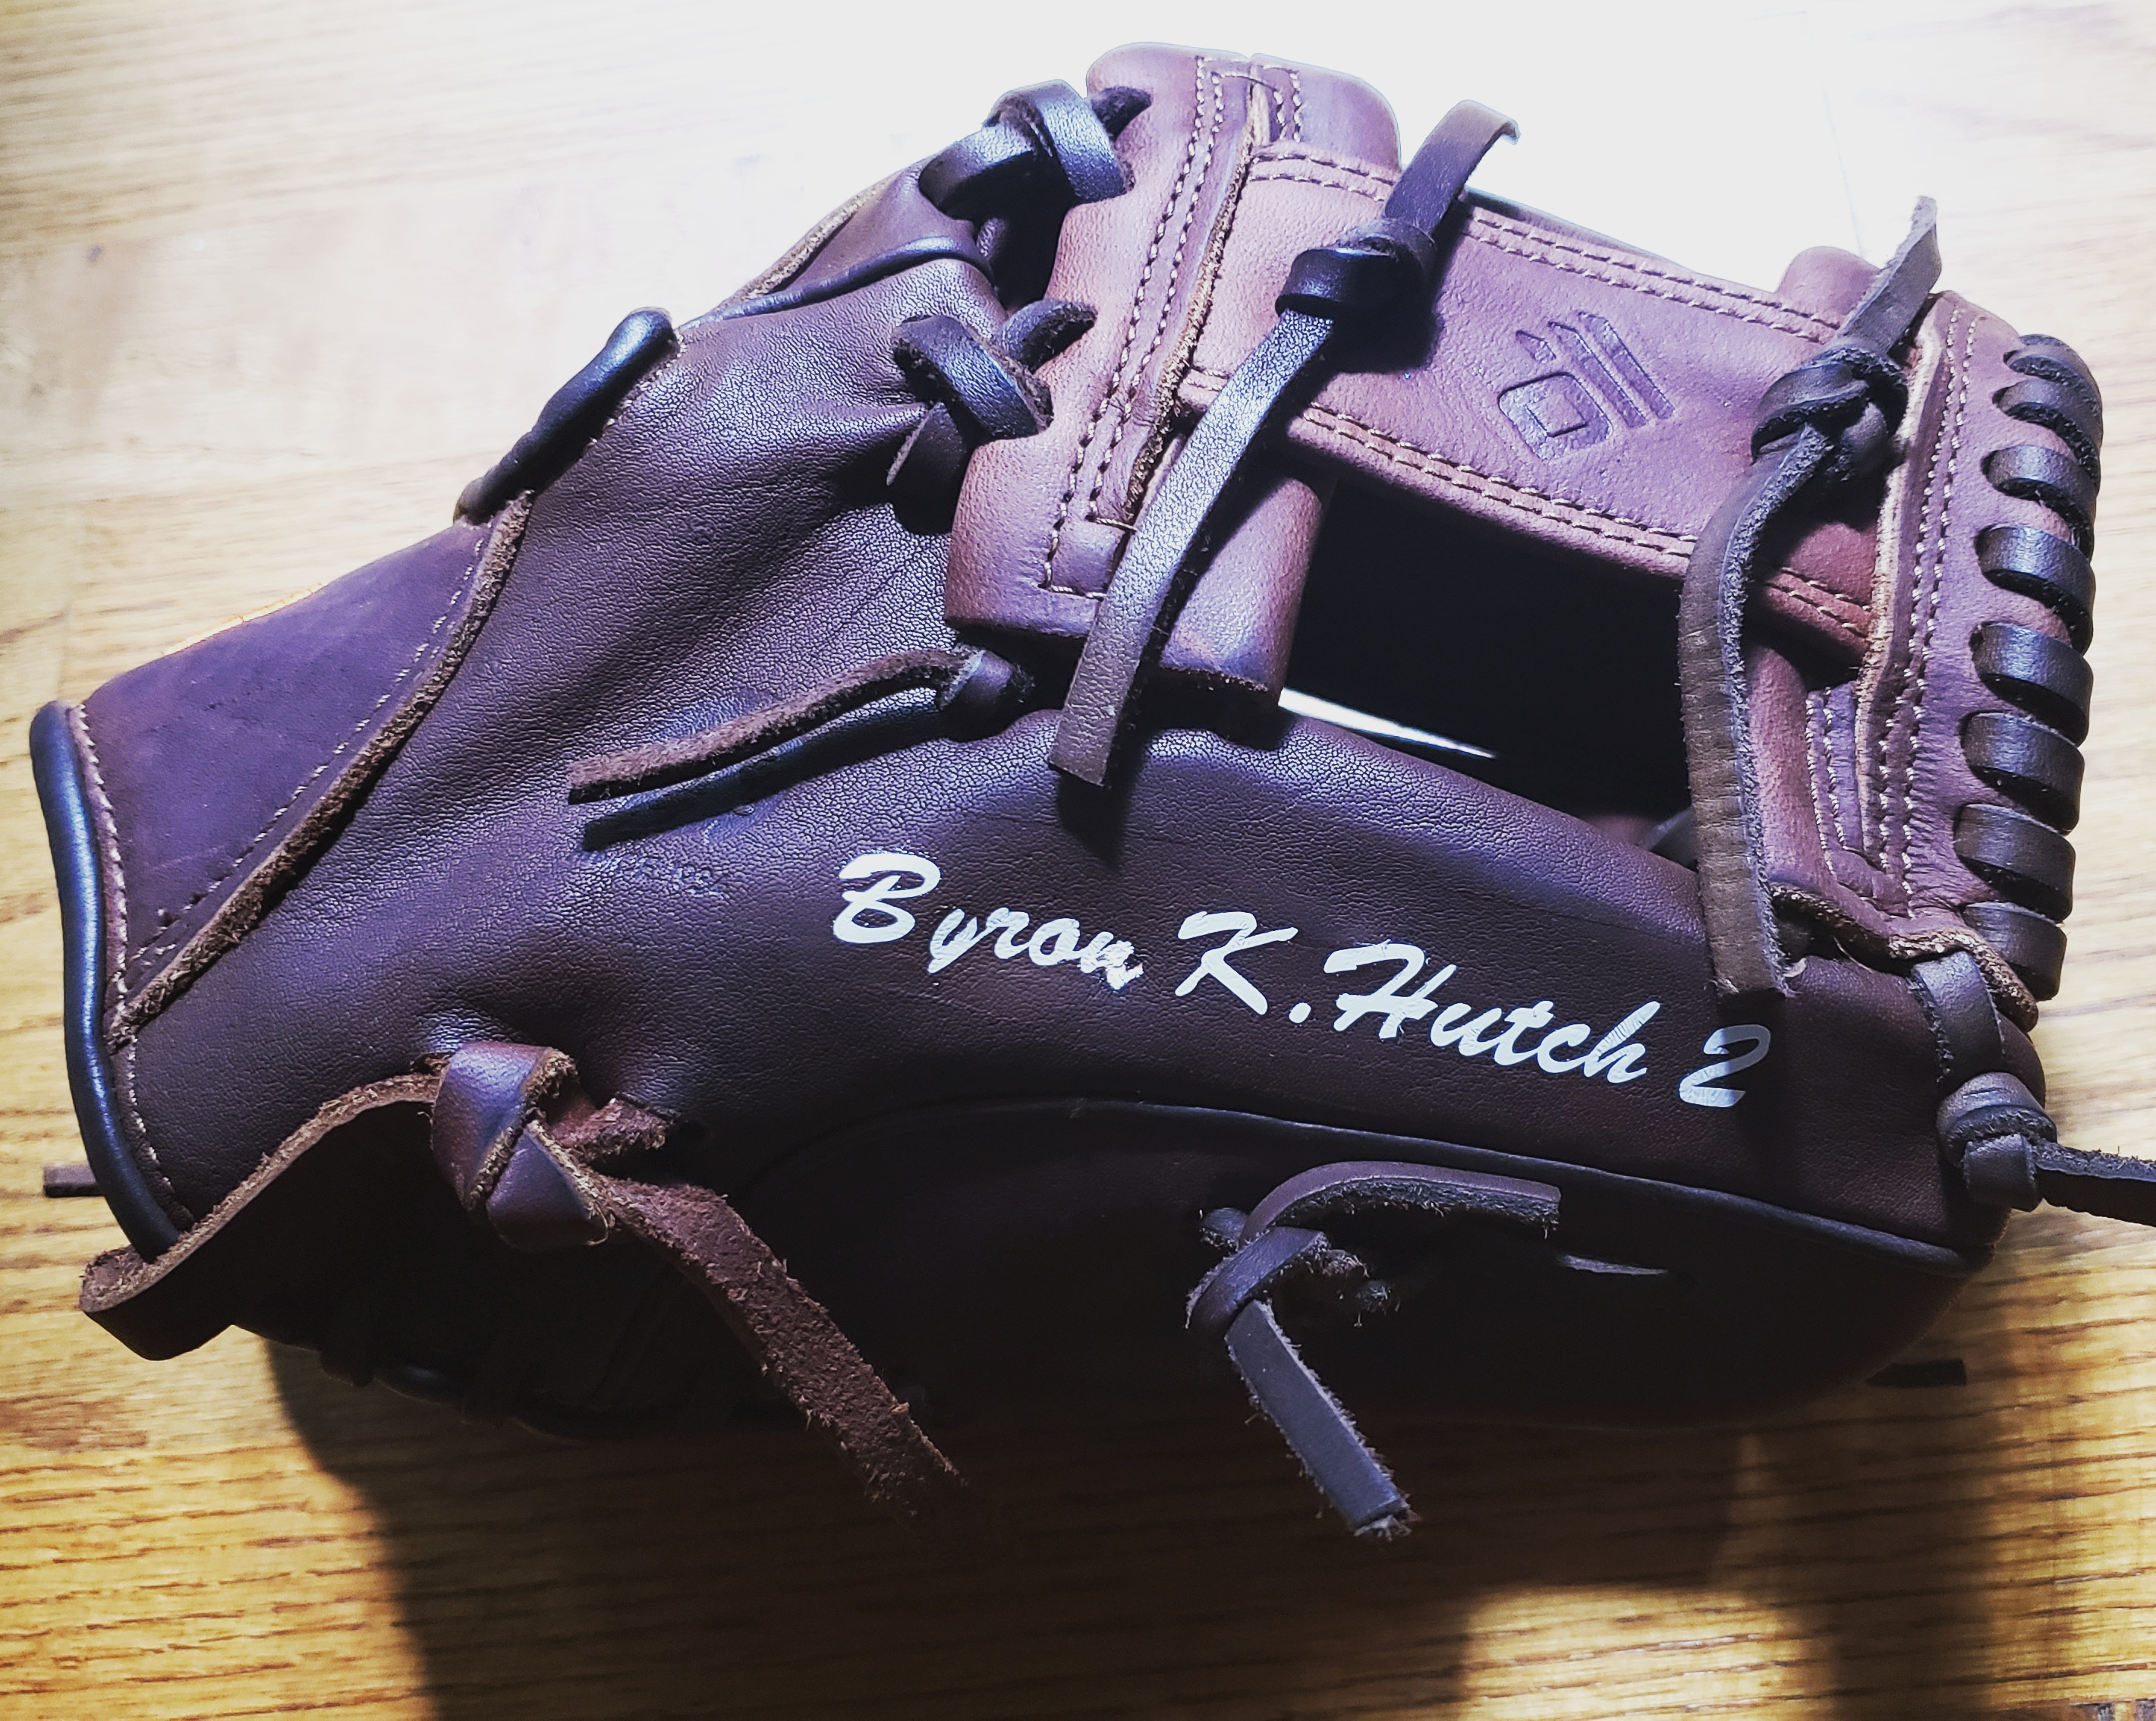 2014 Rawlings Heart Of The Hide 11.5 Glove PRO200RWB